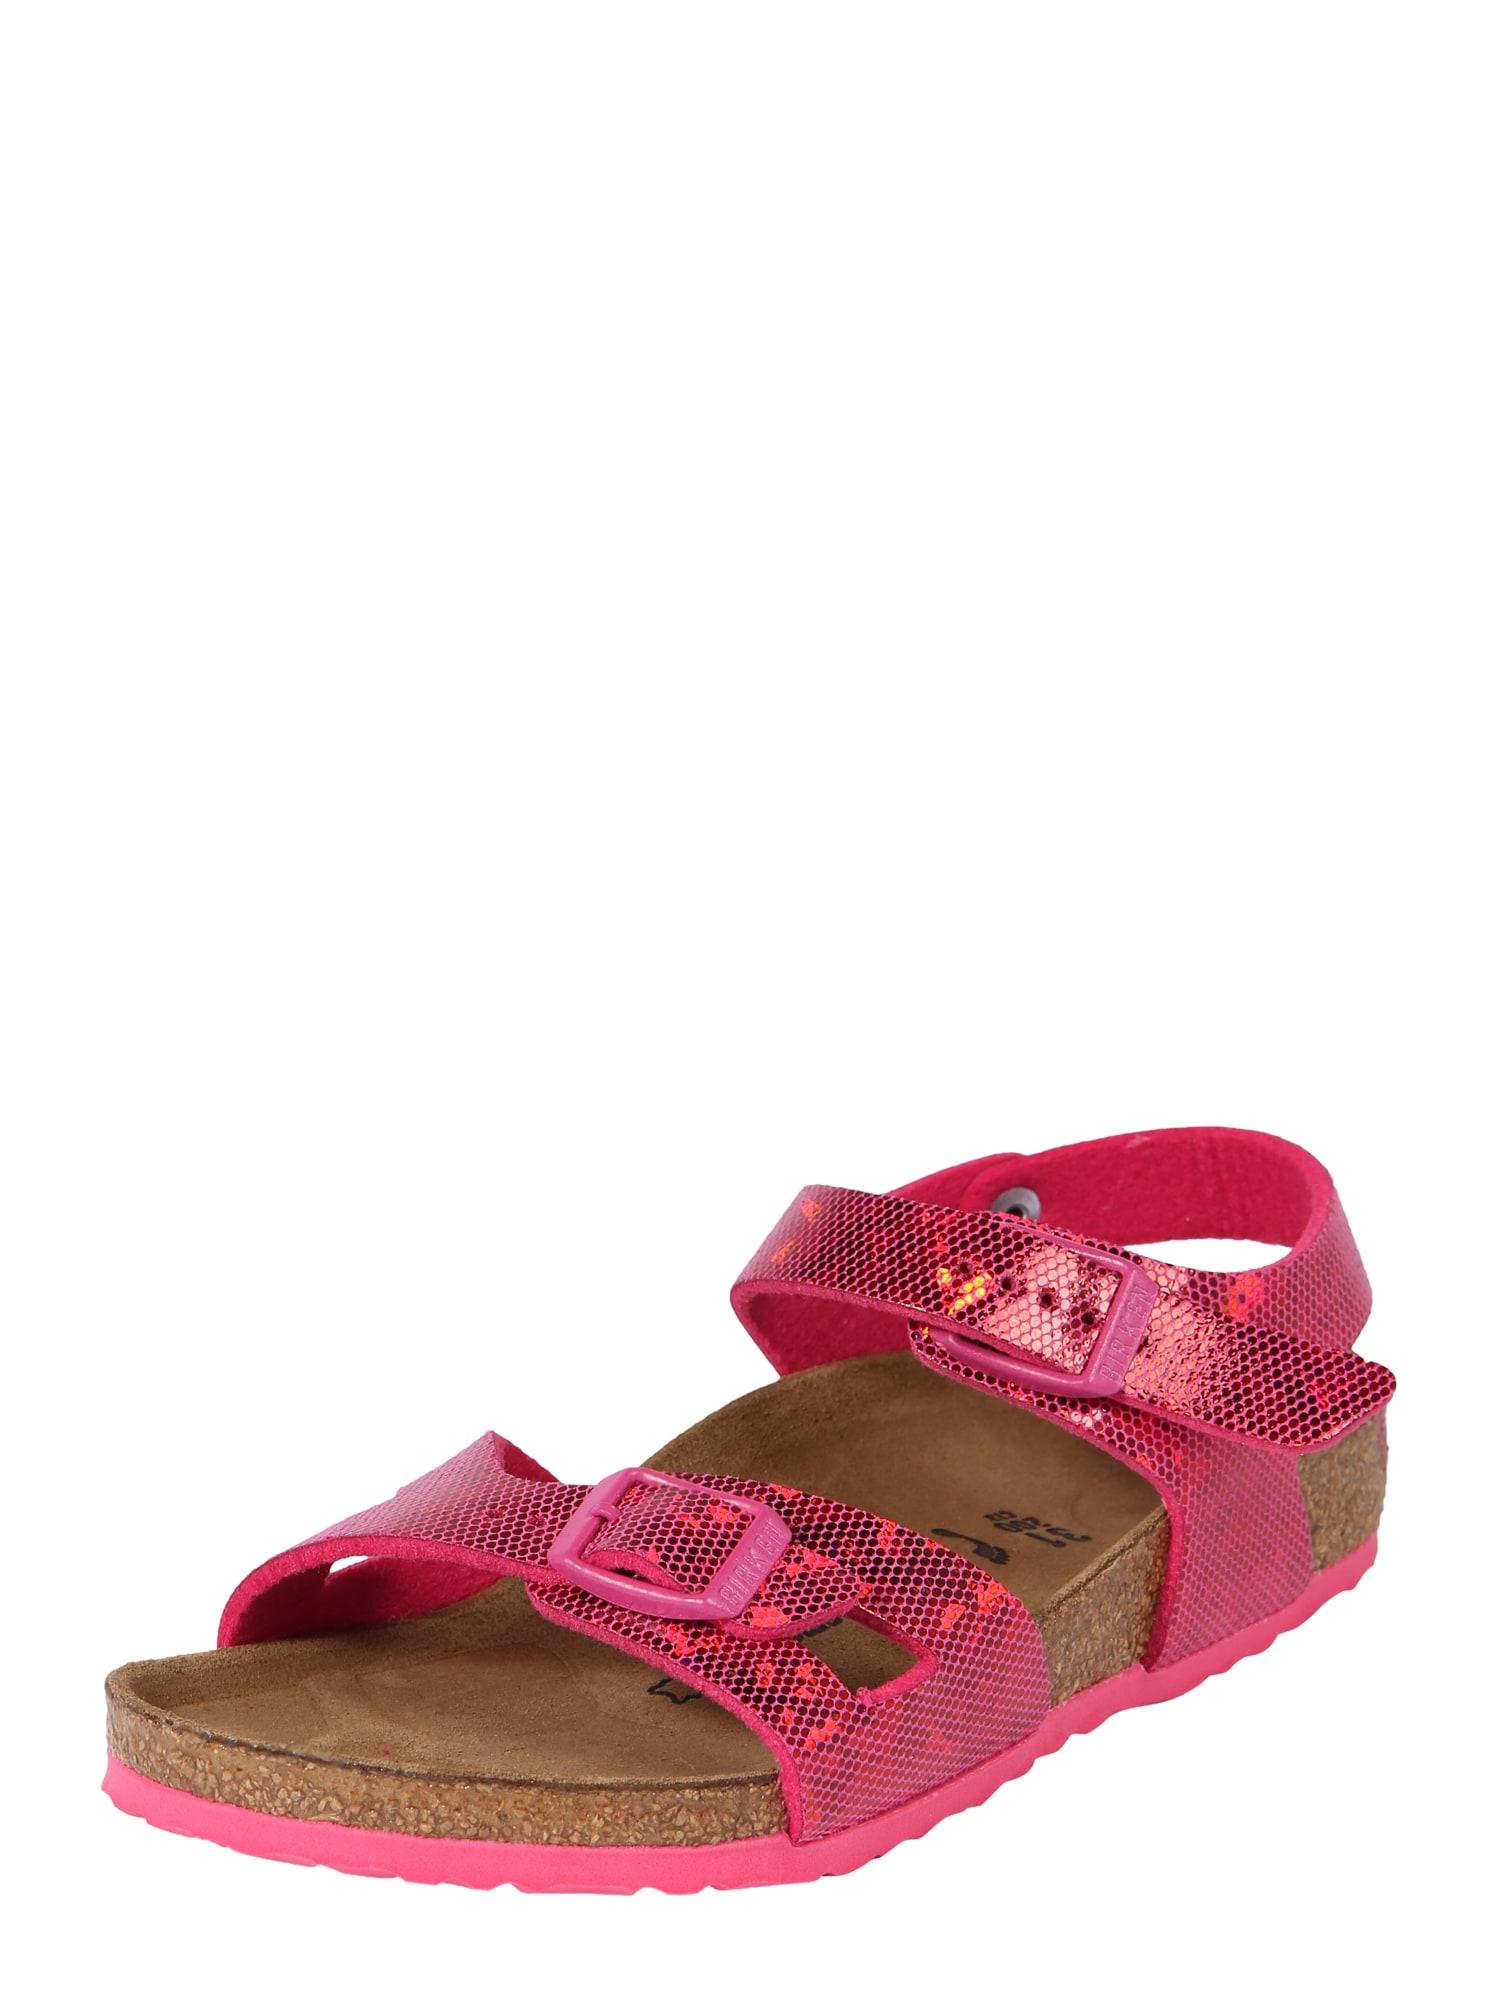 Sandály Rio Kids BF pink BIRKENSTOCK